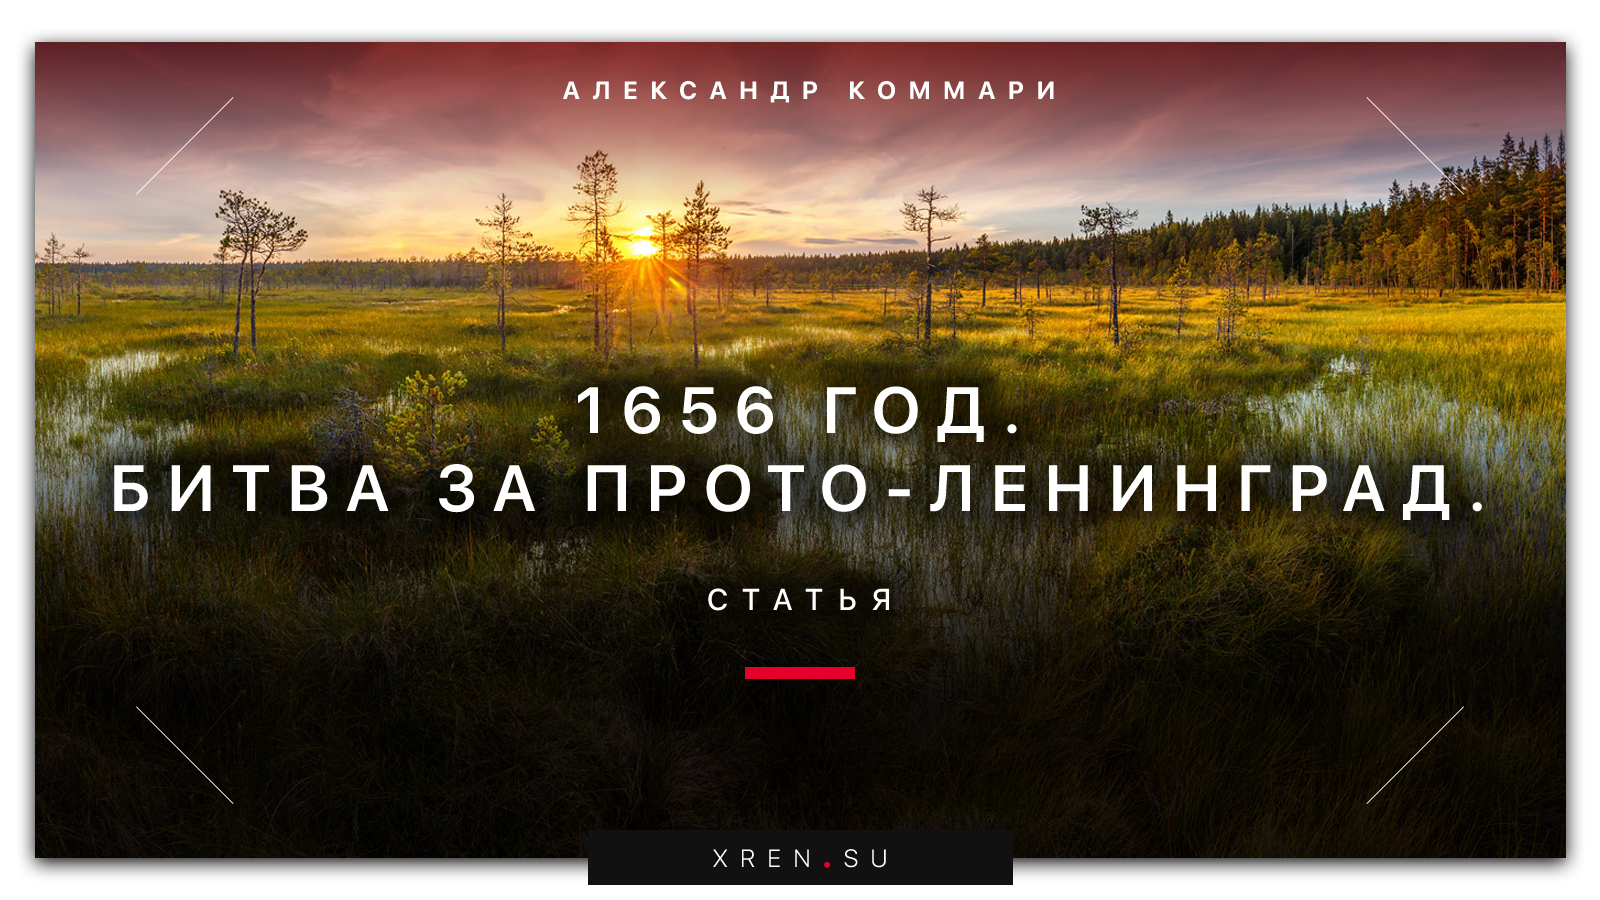 1656 год. Битва за прото-Ленинград.